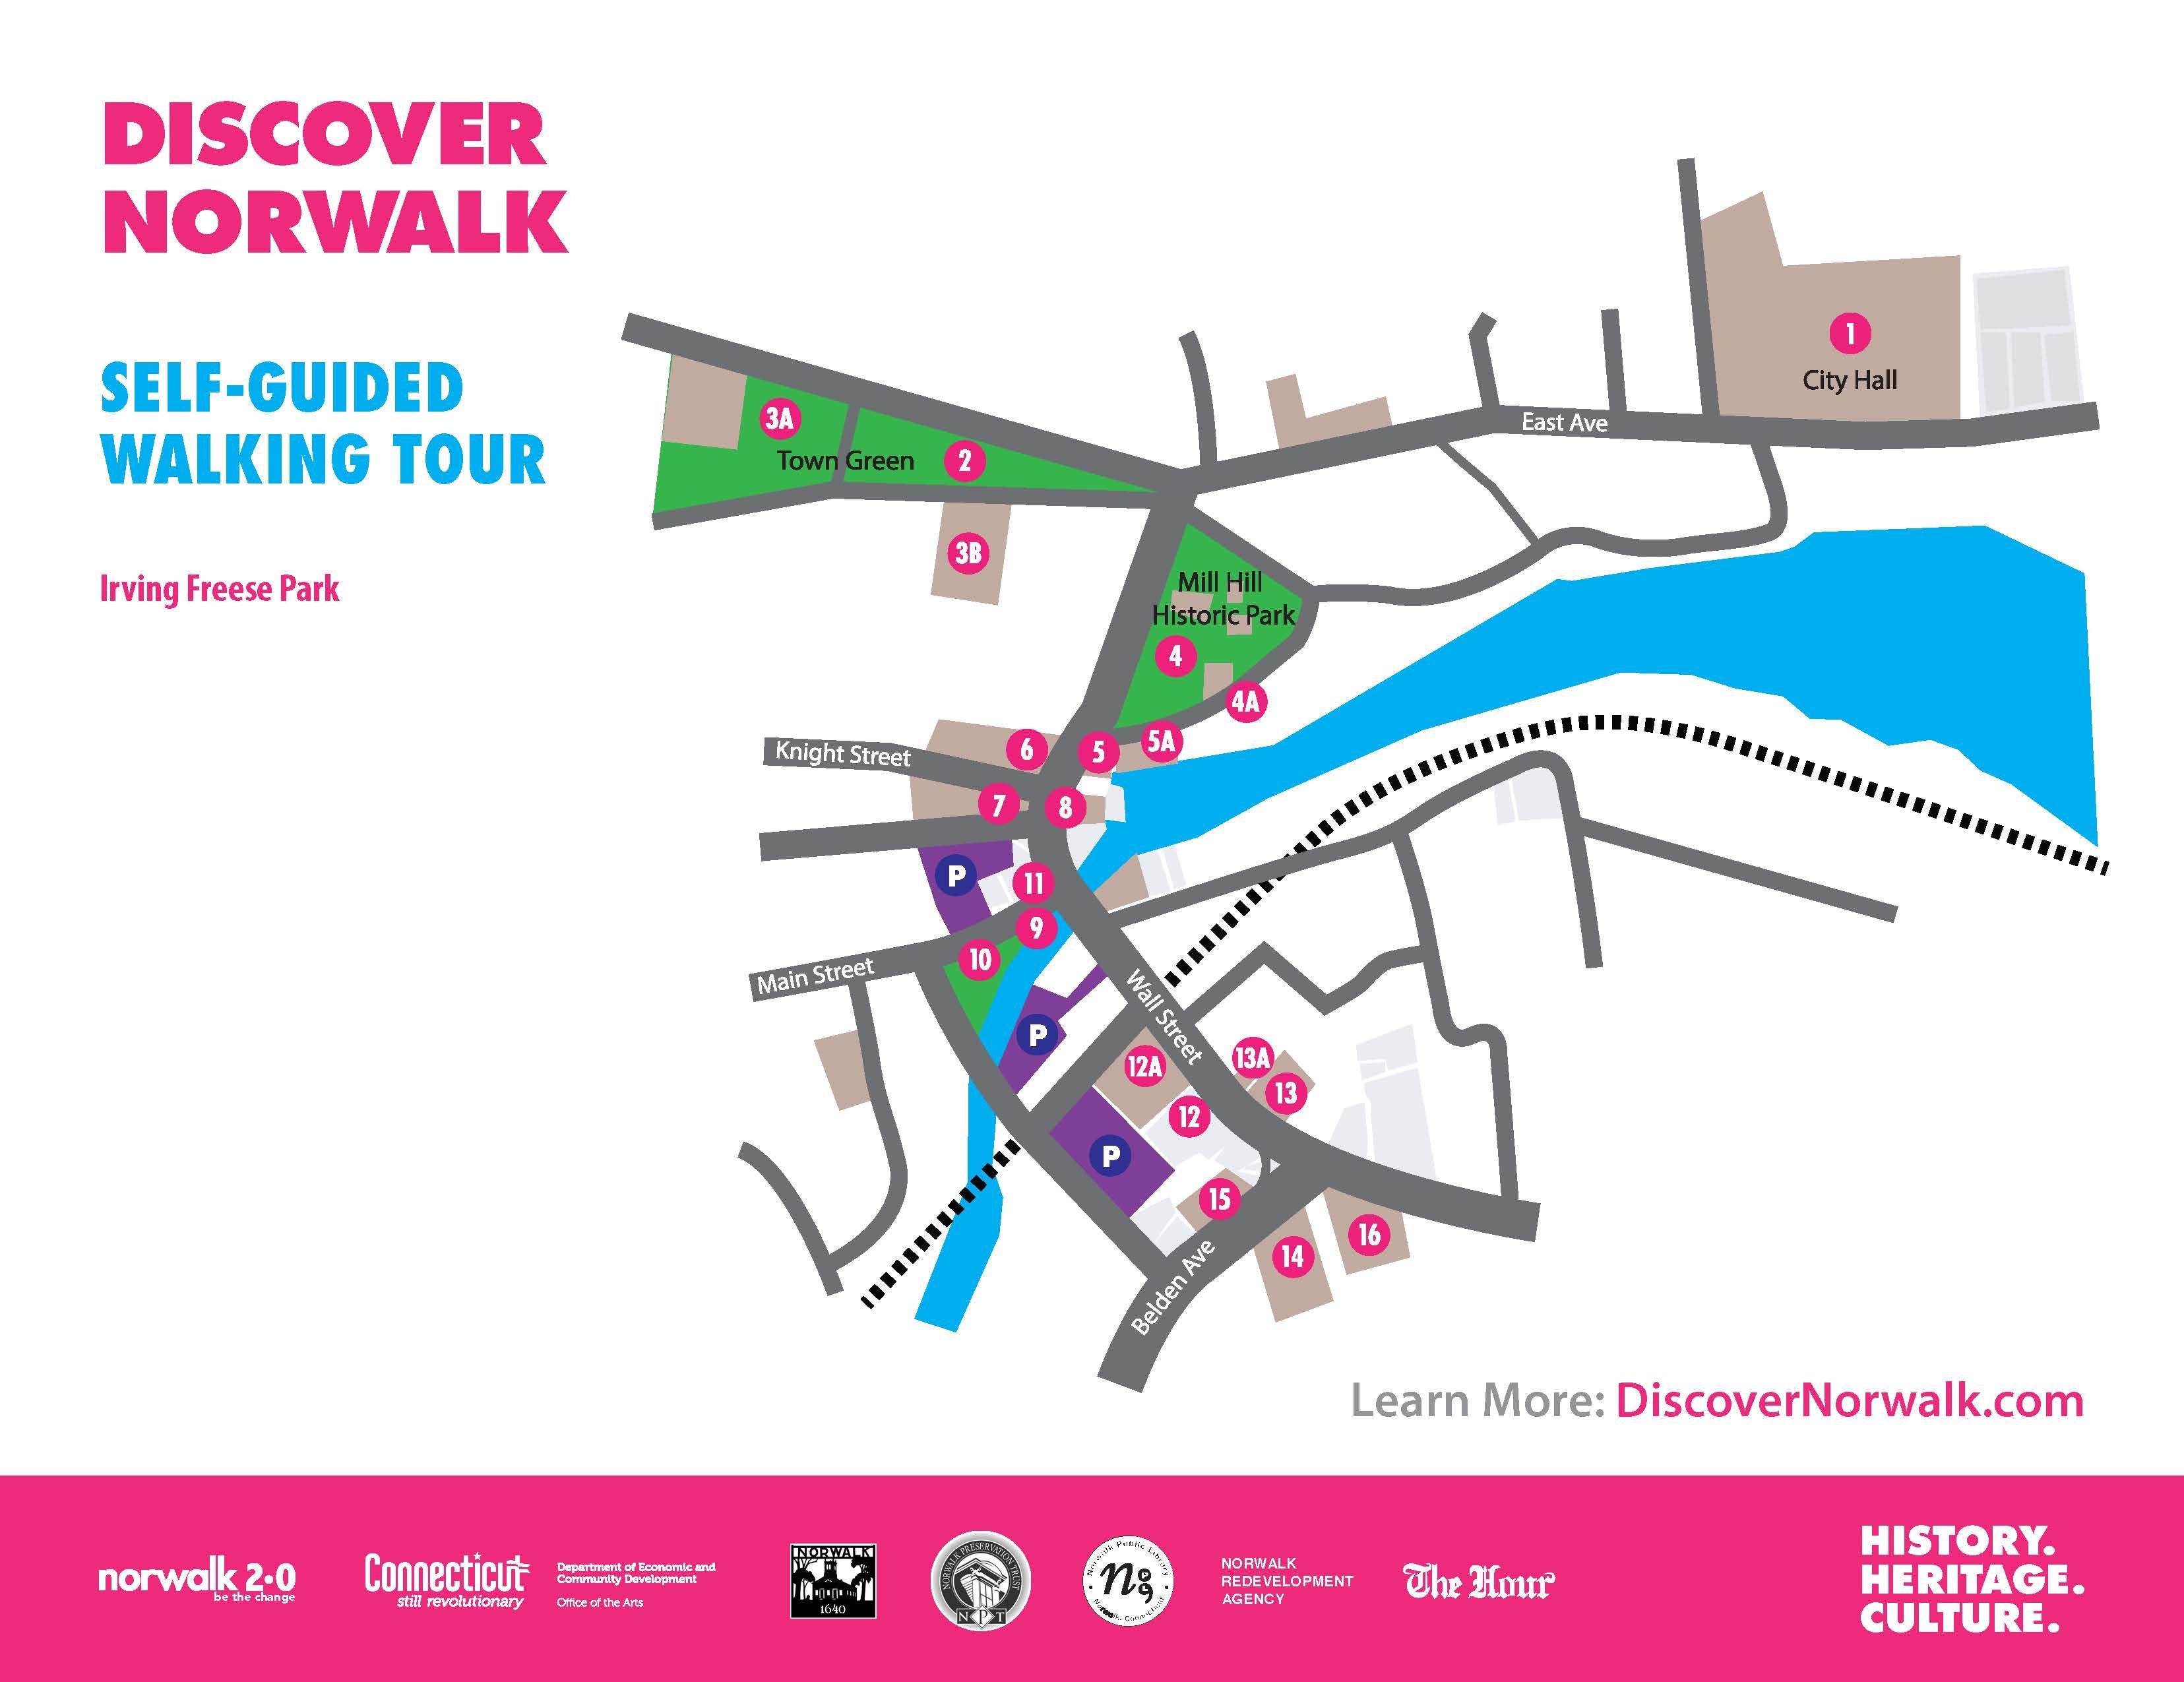 DiscoverNorwalk_WalkingTour_IrvingFreesePark_Page_1